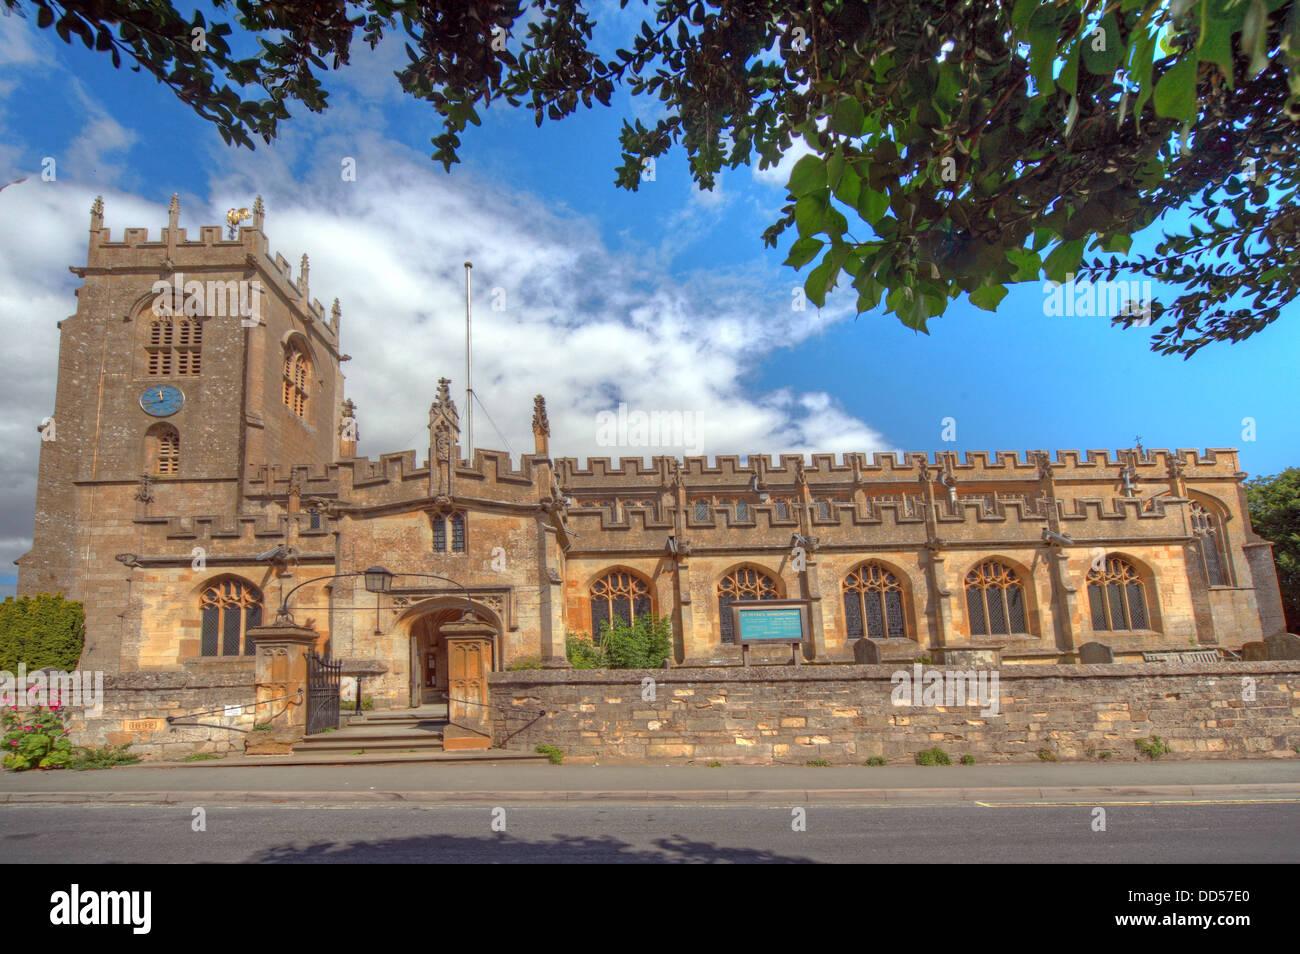 Laden Sie dieses Alamy Stockfoto St. Peters Kirche, Winchcombe, Cheltenham, Gloucestershire, England, GL54 5LU - DD57E0